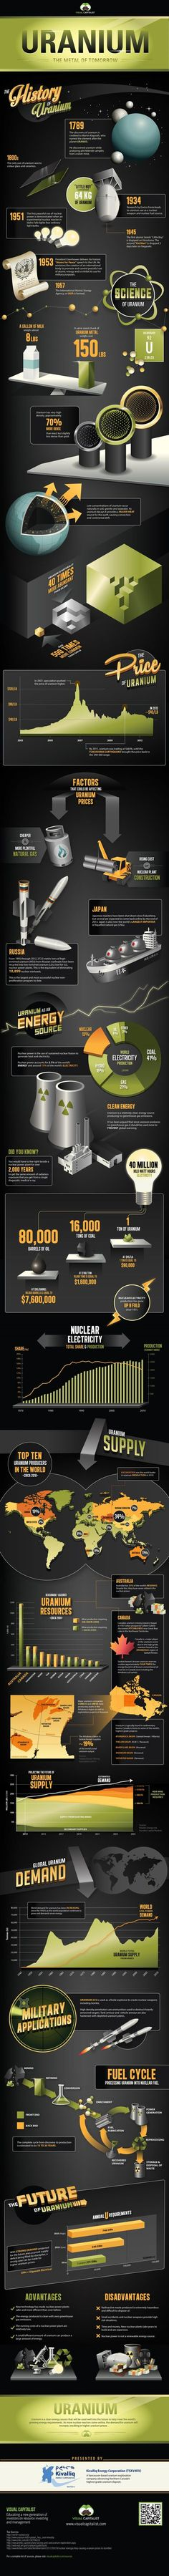 Uranium, the Metal of Tomorrow